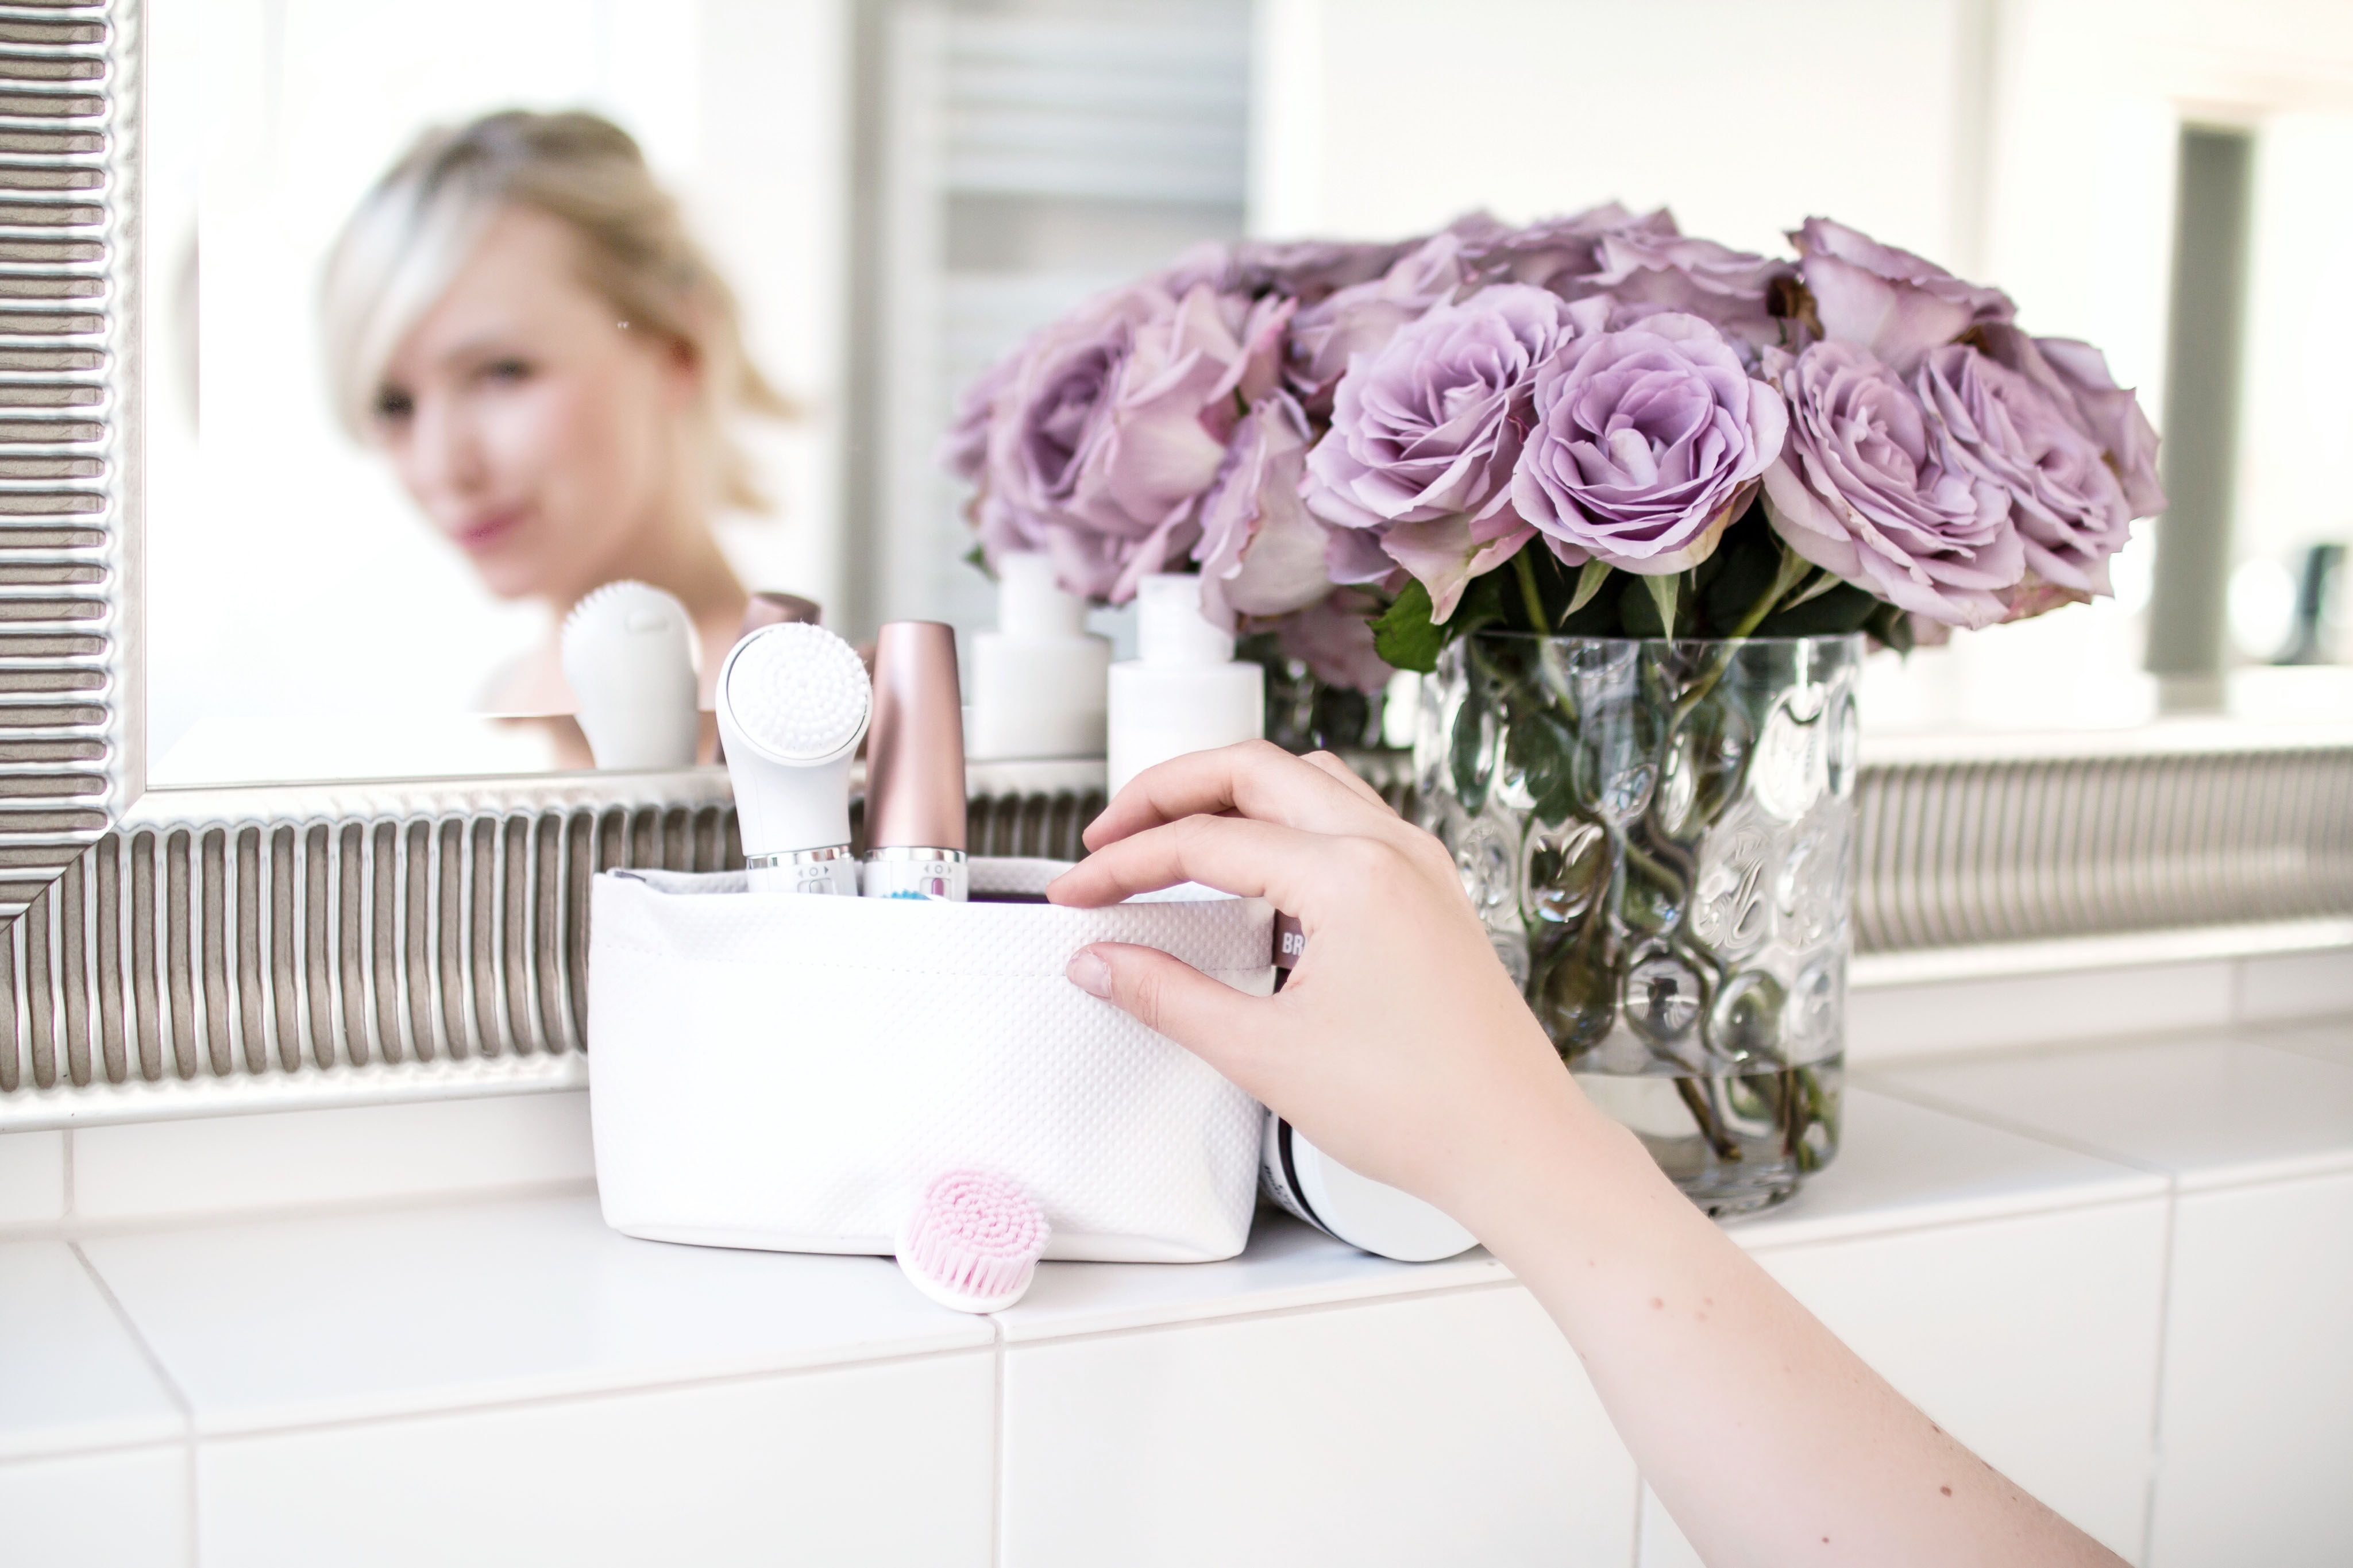 FaceSpa_Braun_beauty_gesichtspflege_Reinigung_zukkerme